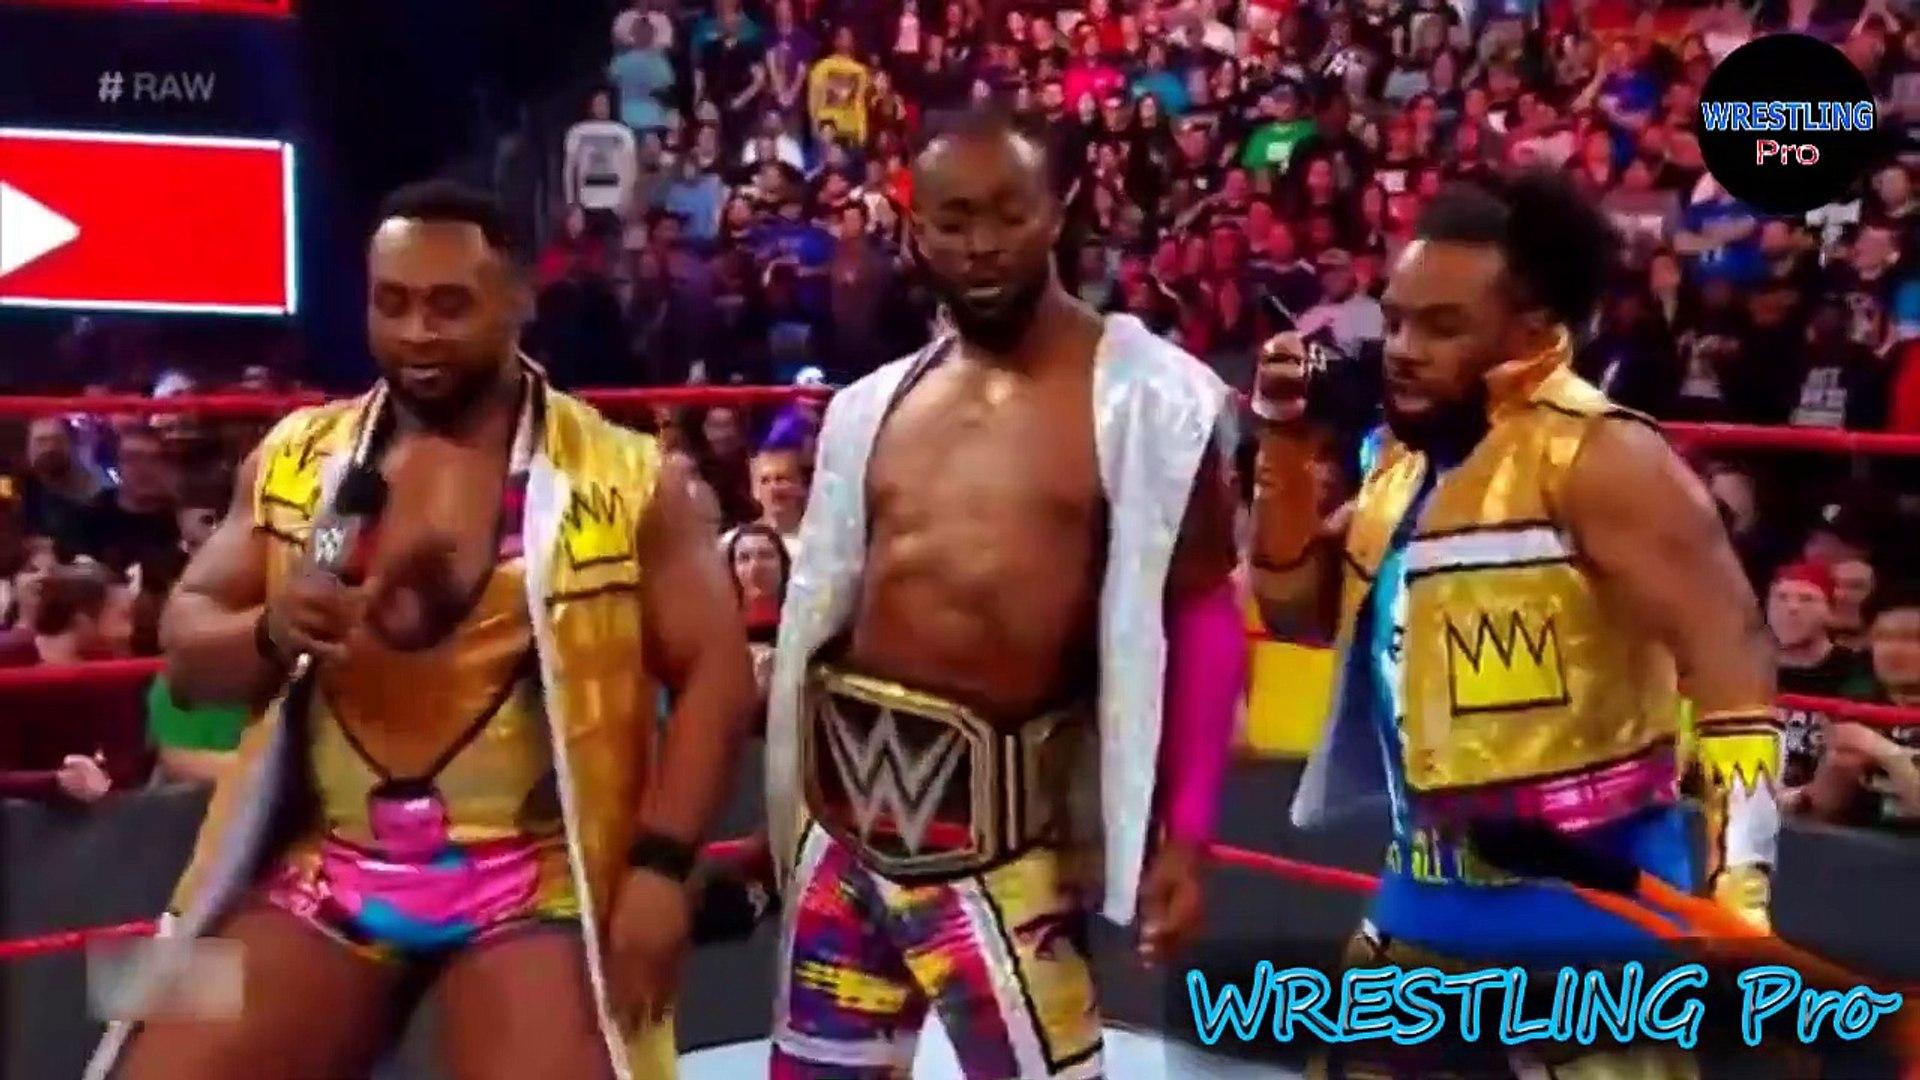 WWE RAW Highlights 8th April 2019 - WWE RAW 08-04-2019 Highlights HD